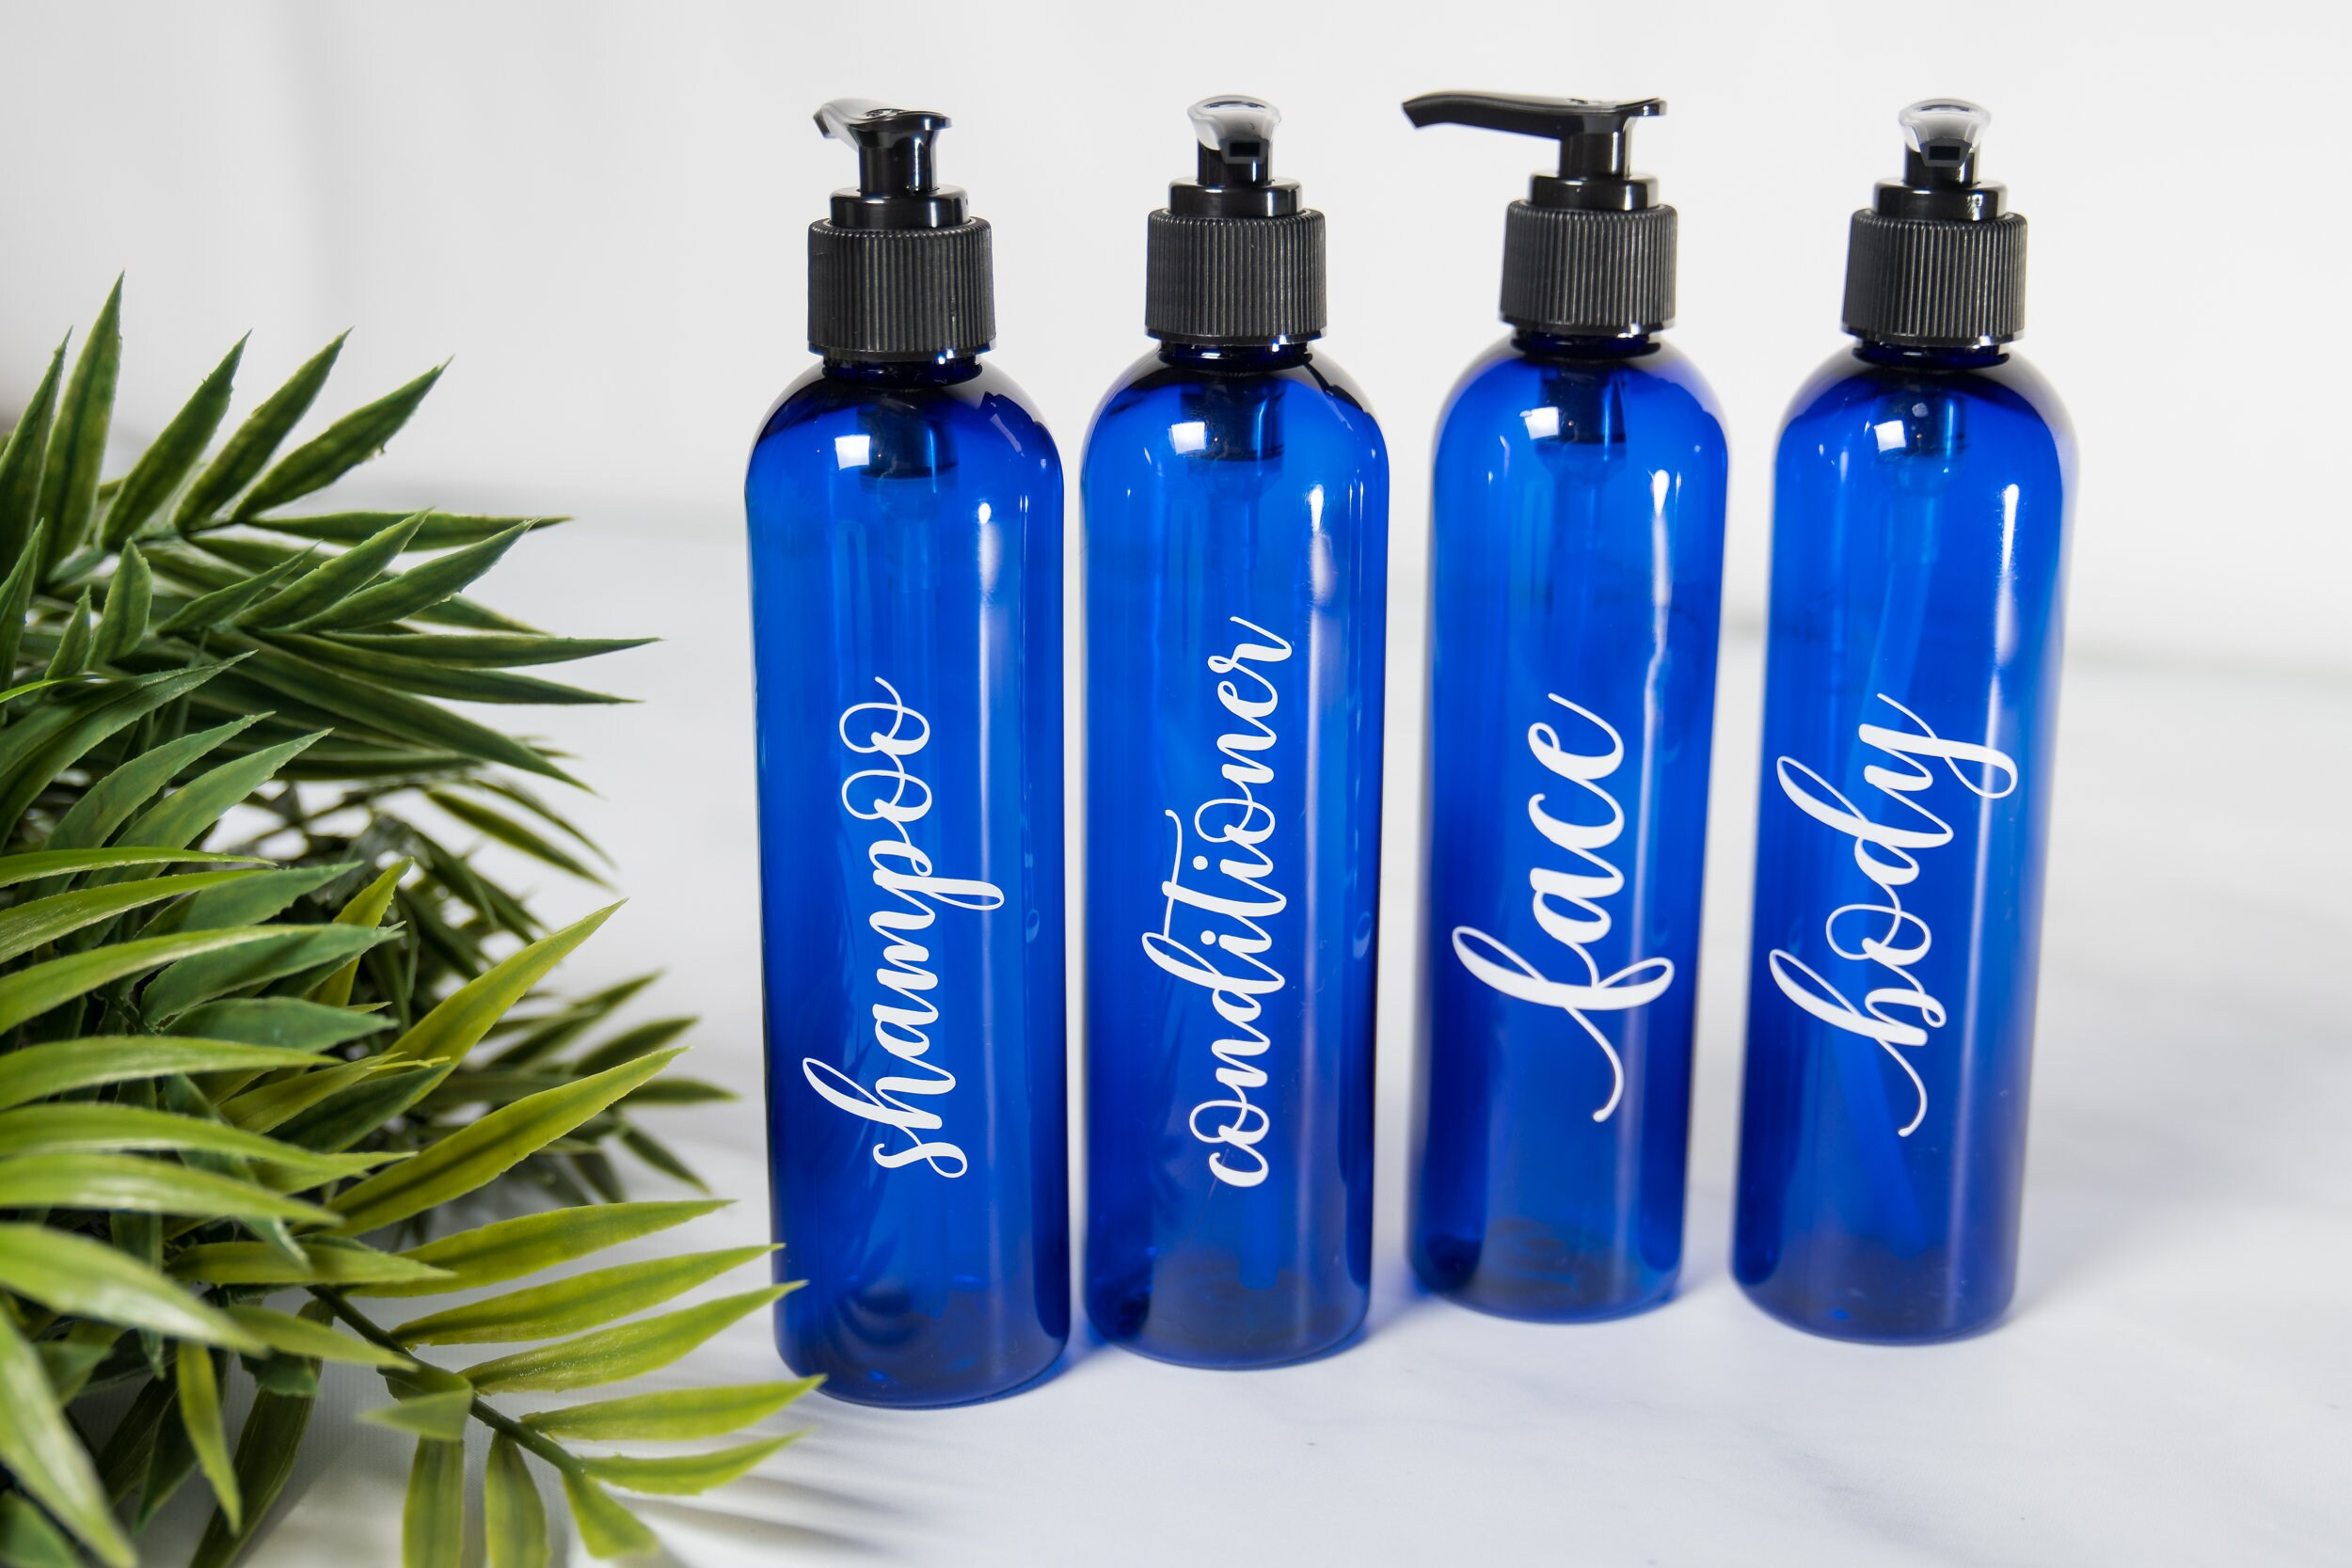 Spa Like Bathroom Decor, Travel Accessories and Organizers, Shampoo  Conditioner Body Wash Bottle, Face Wash Pump, Blue Bathroom Accessories